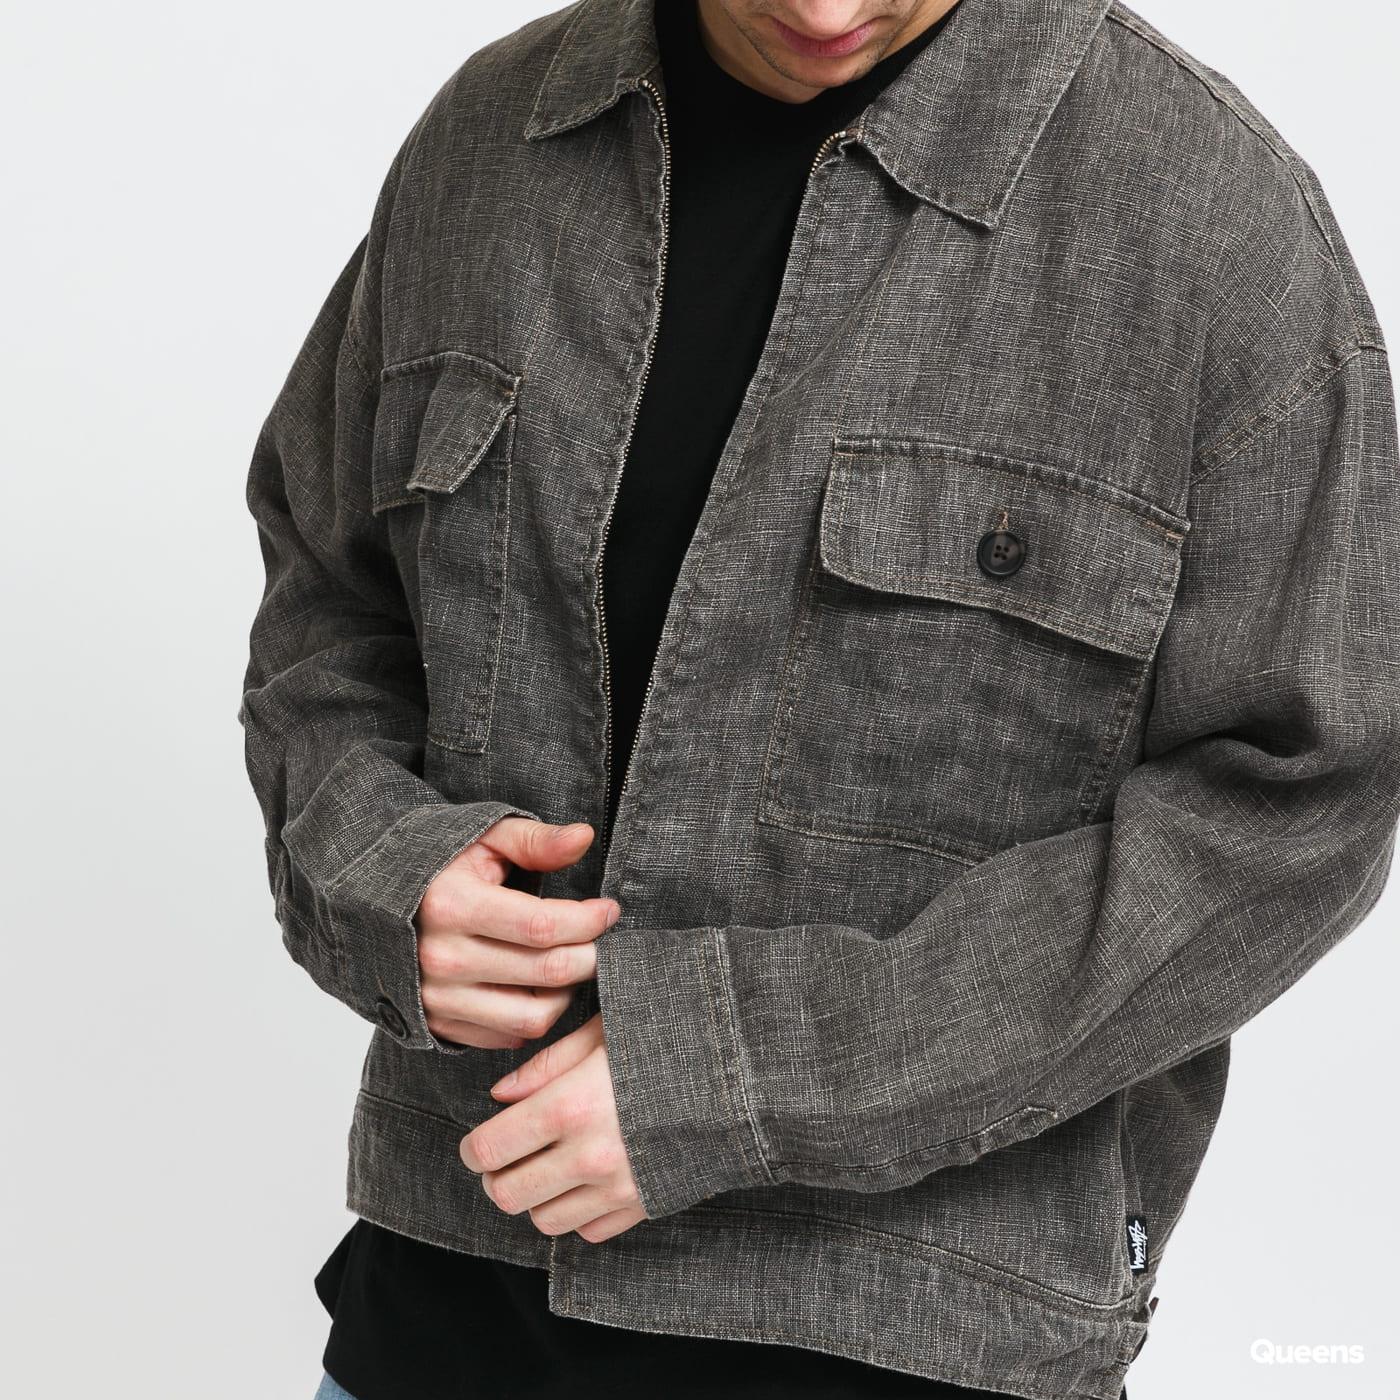 Stüssy Boxy Linene Zip Jacket dark gray